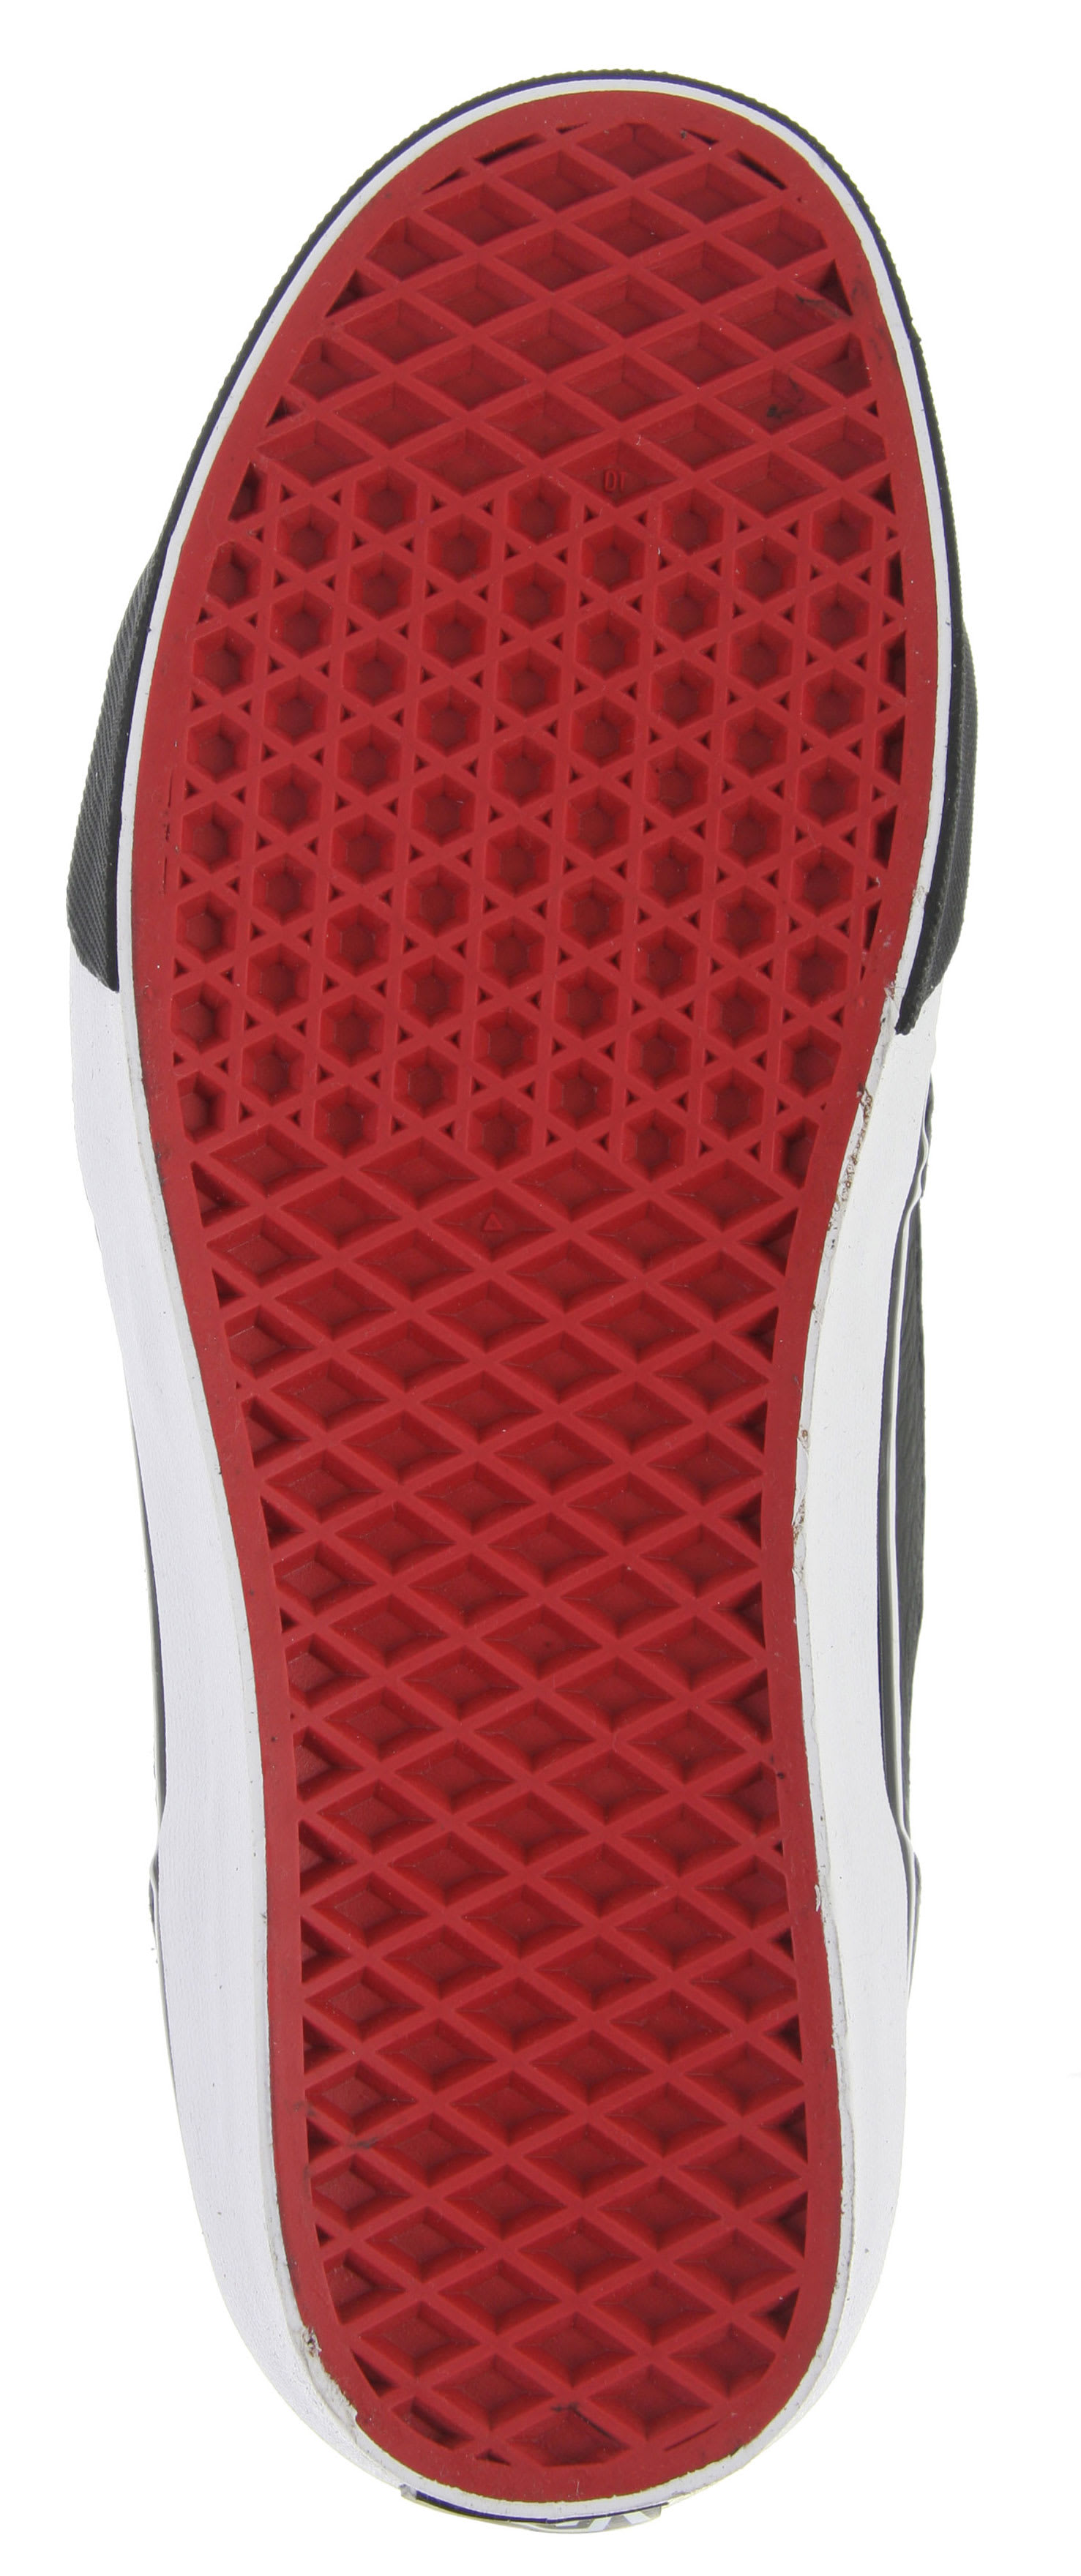 ac876919f8 Vans Owens Hi Vulc Mu Skate Shoes - thumbnail 3